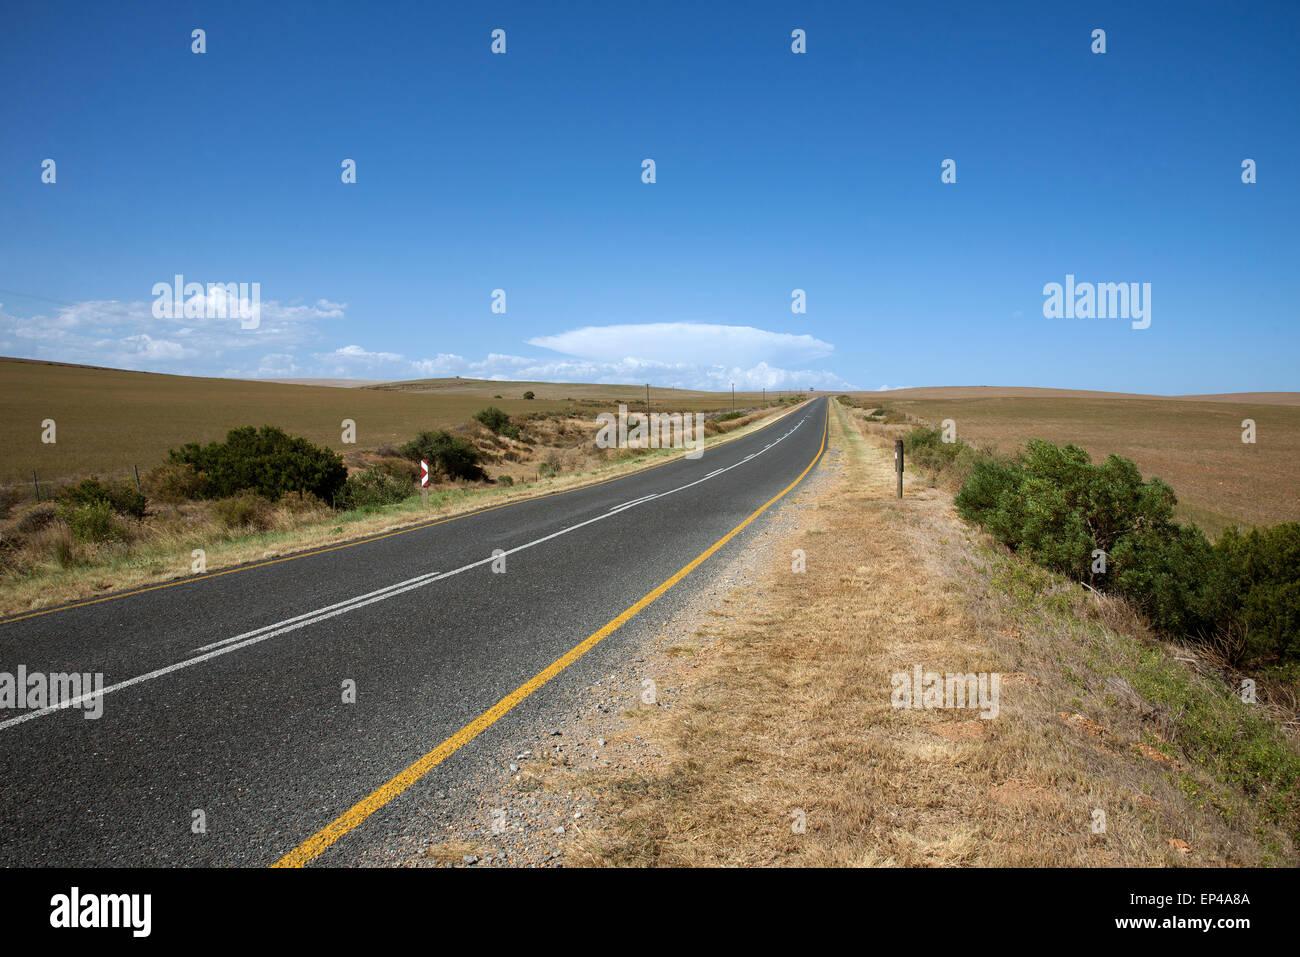 Abrir carretera sin tráfico que pasa a través de la zona del Cabo Occidental de Sudáfrica Foto de stock